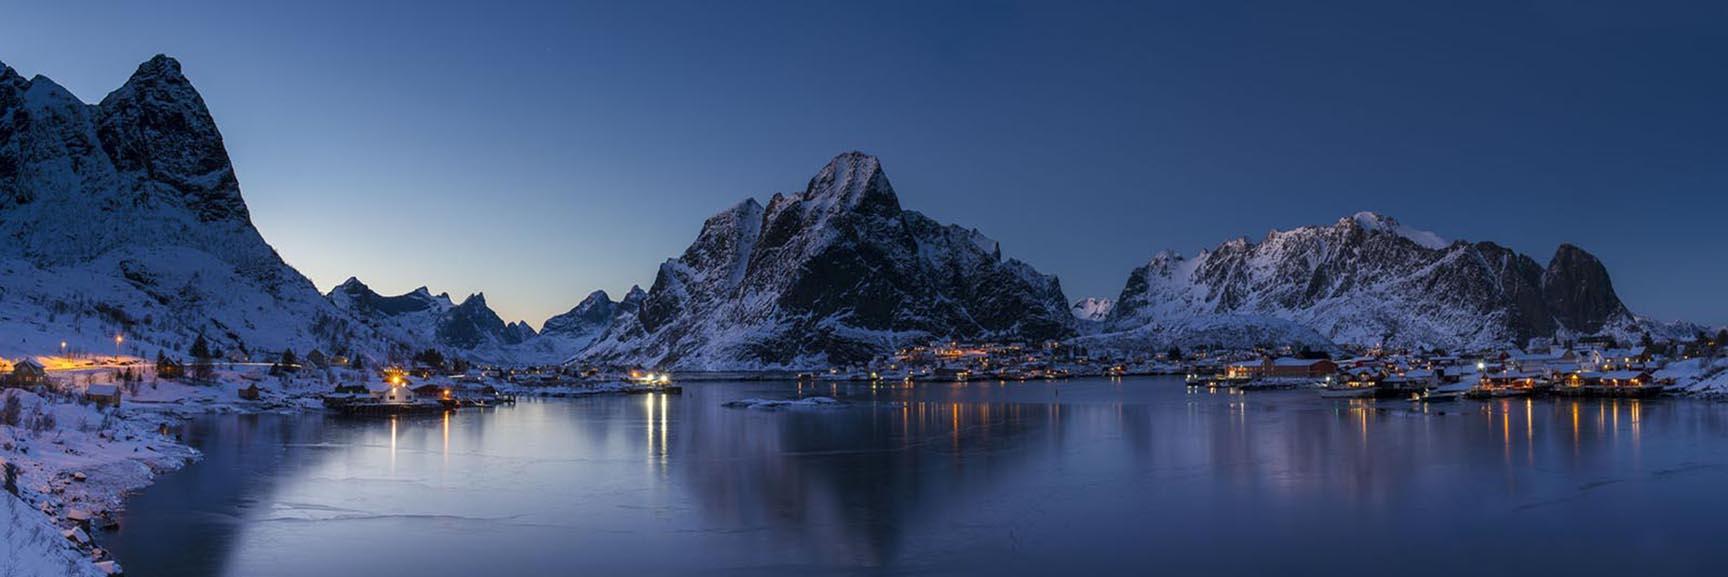 Village lights create pops of warm light as twilight descends upon the village of Reine in the Lofoten Islands, Norway.